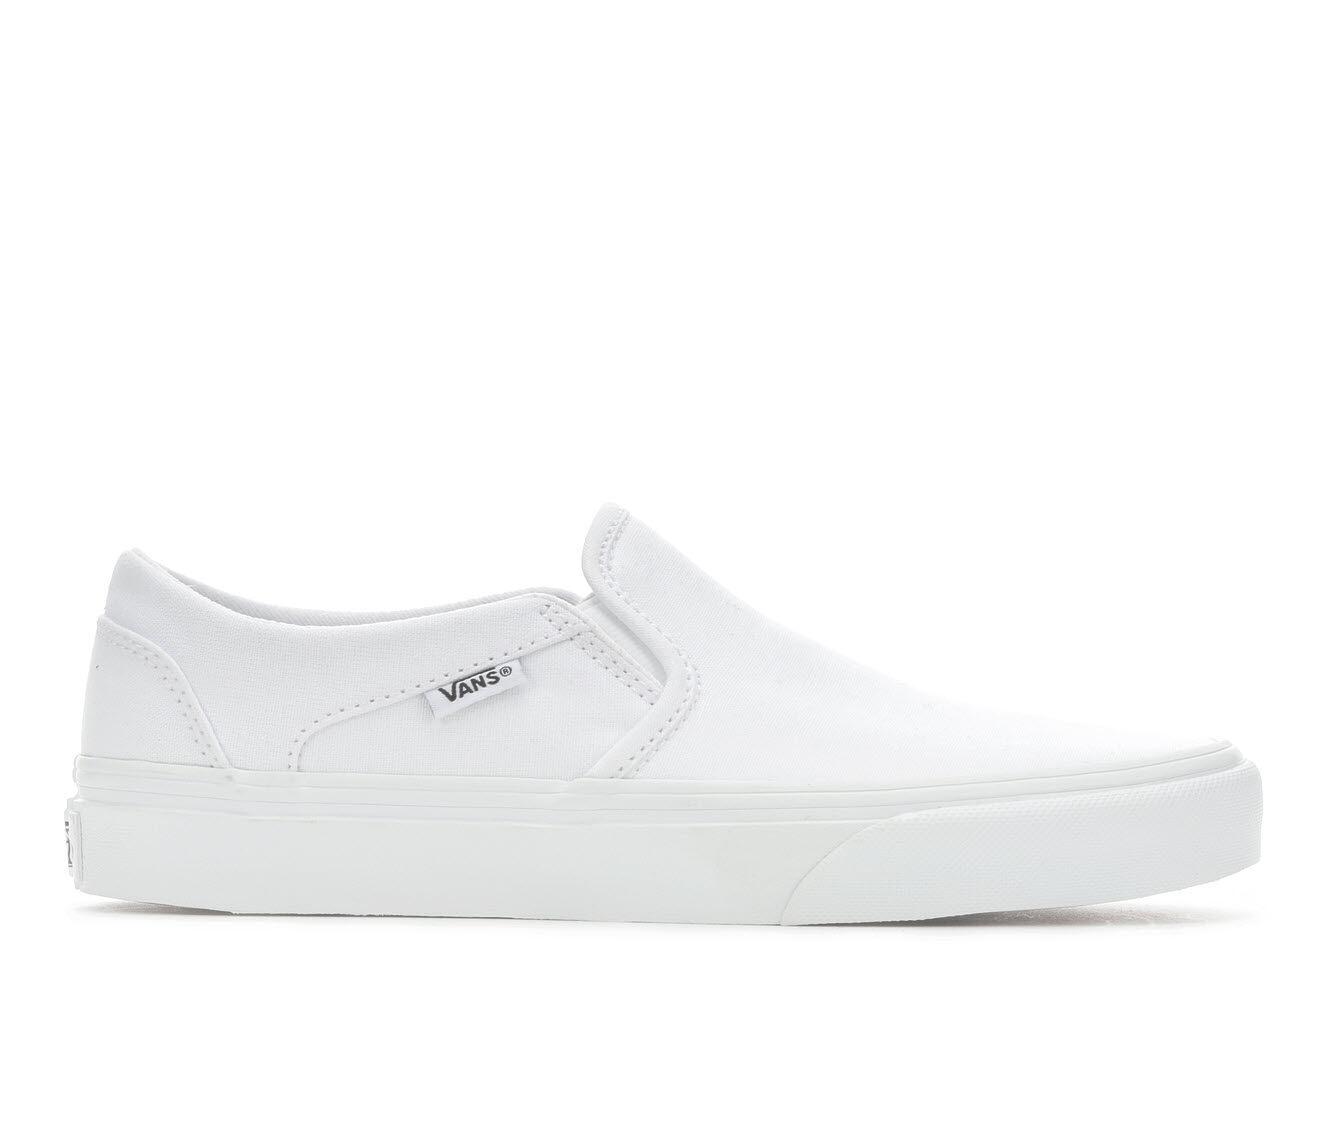 Fashionable Women's Vans Asher Slip-On Skate Shoes White Mono